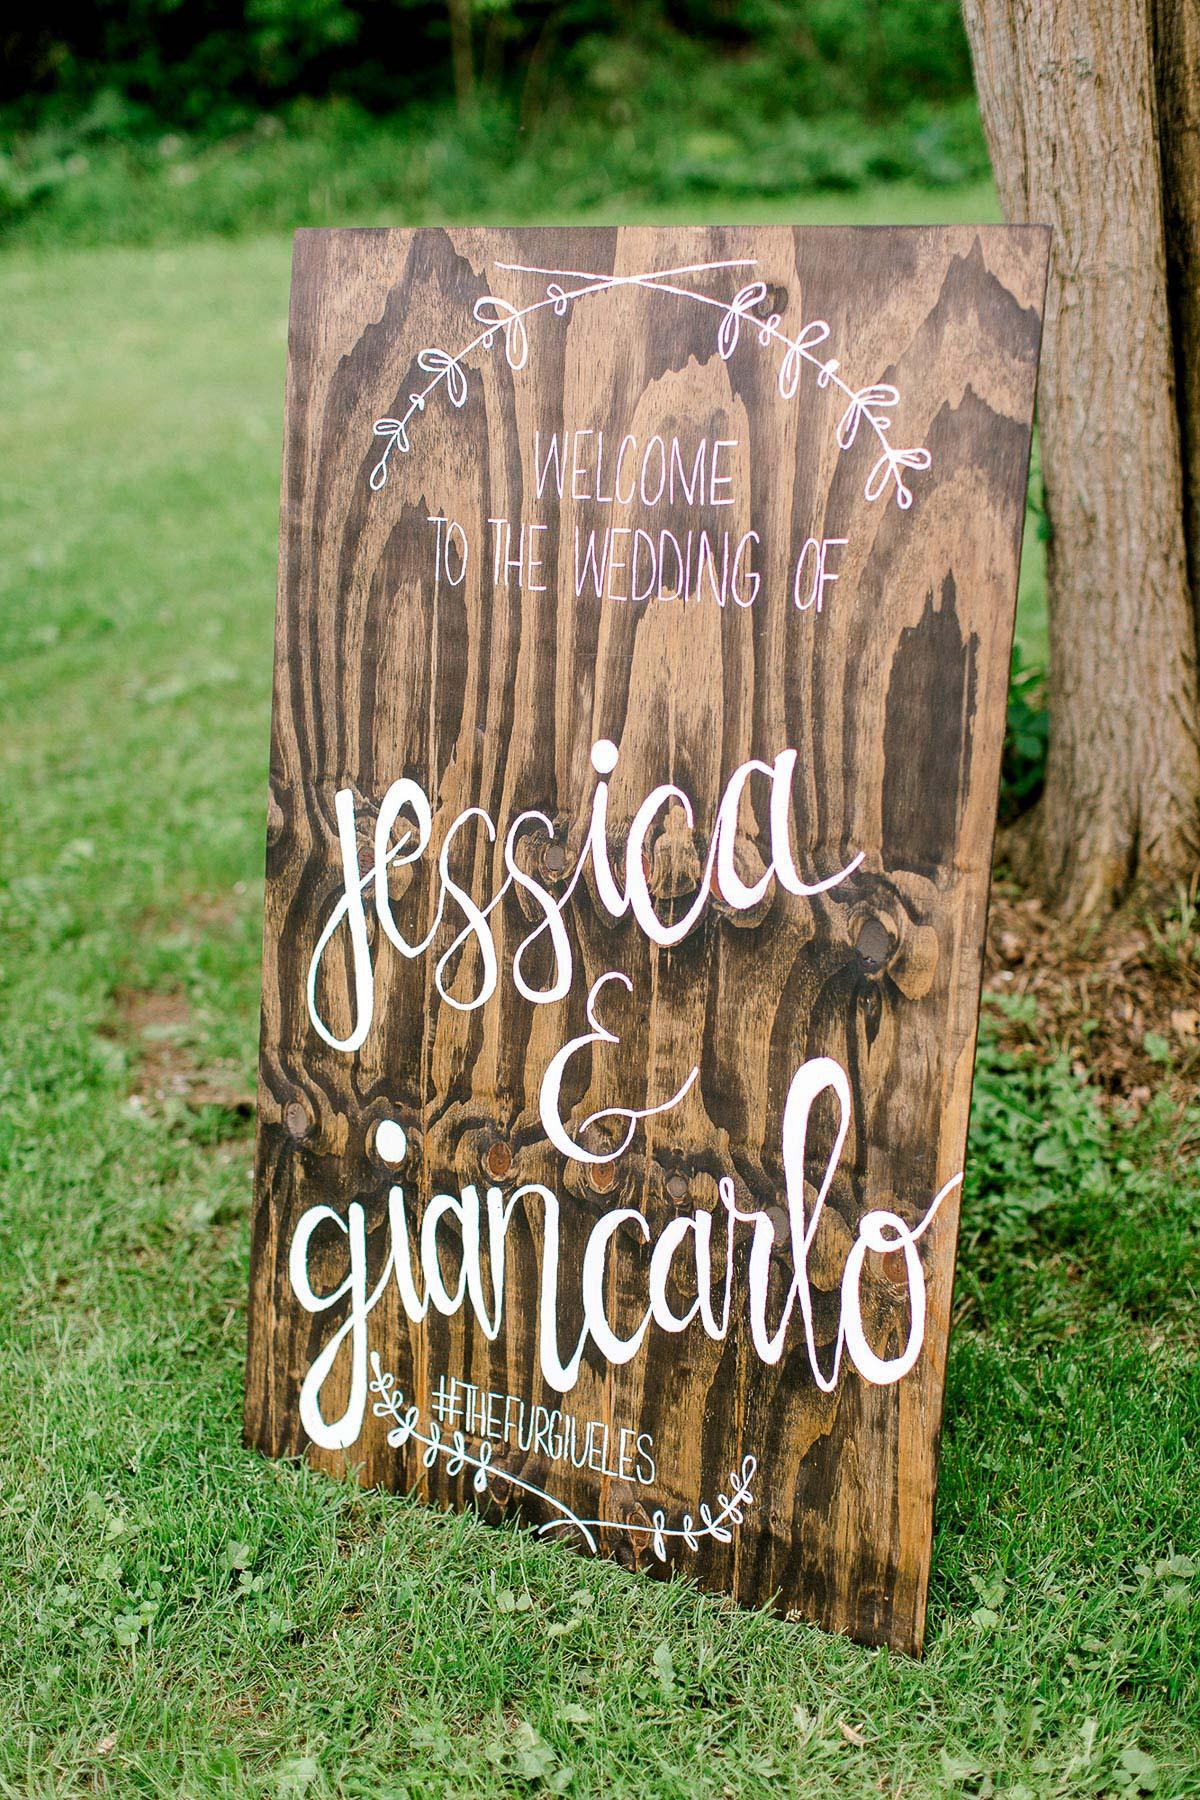 beatrice-elford-photography-vineyard-bride-swish-list-balls-falls-vineland-wedding-41.jpg